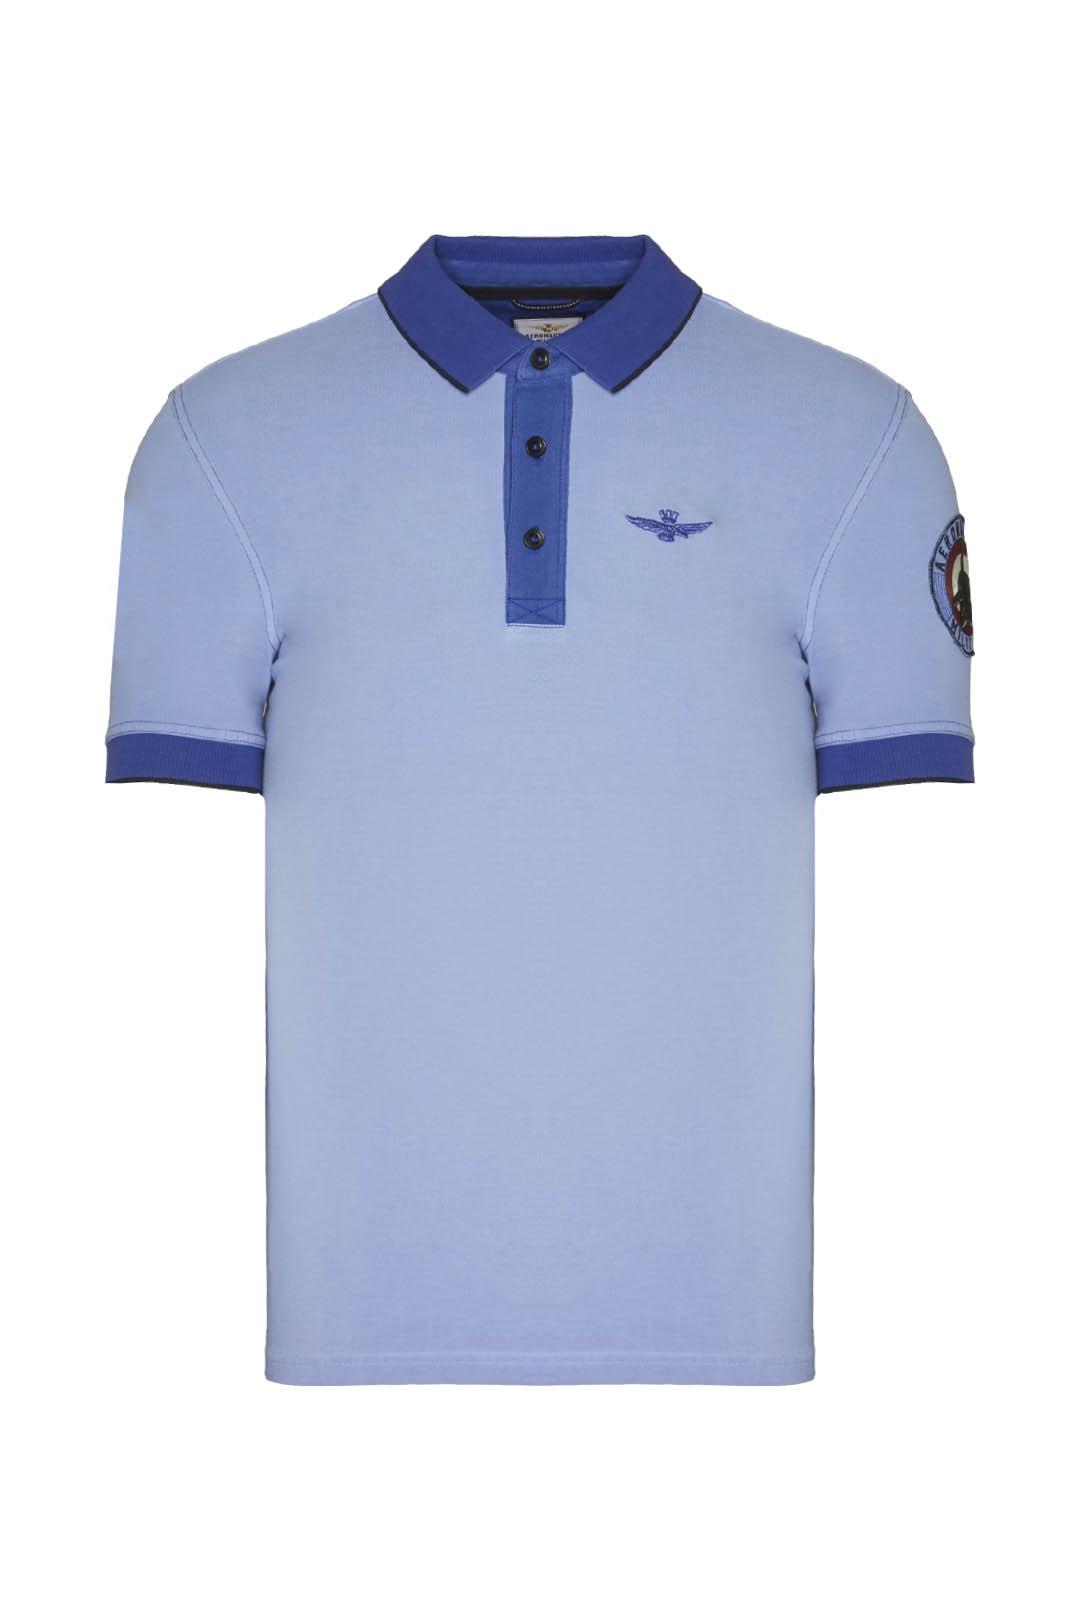 102°Gruppo Poloshirt mit Kontrastdetails 1